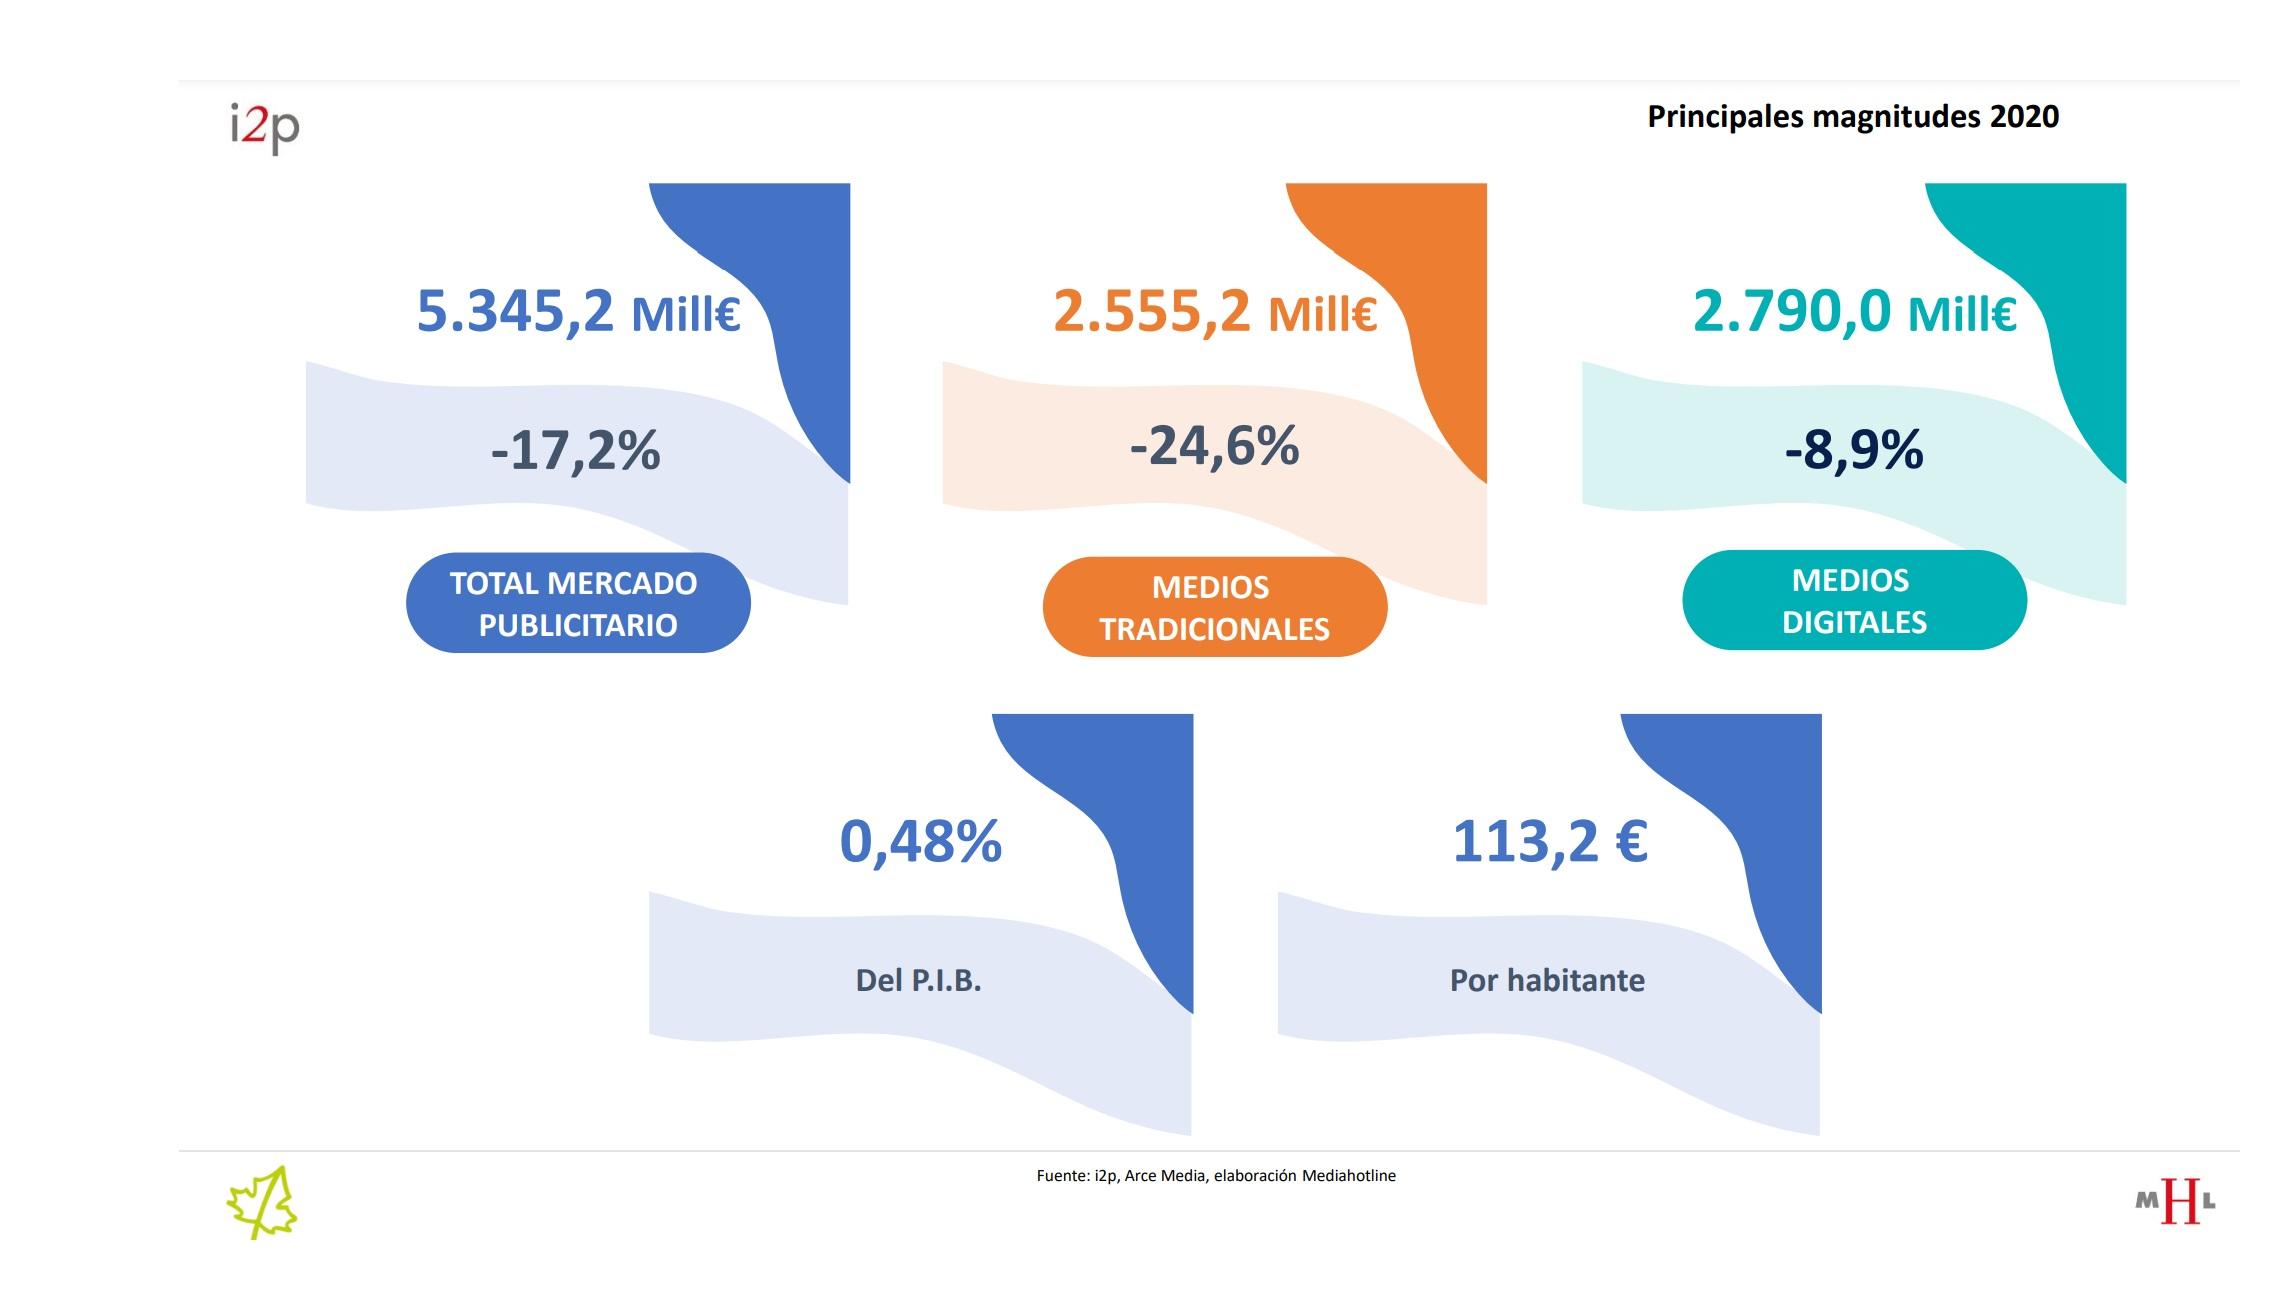 https://www.programapublicidad.com/wp-content/uploads/2021/02/i2p-arce-media-audista-Índice-Inversión-Publicitaria-Año-2020-programapublicidad.jpg